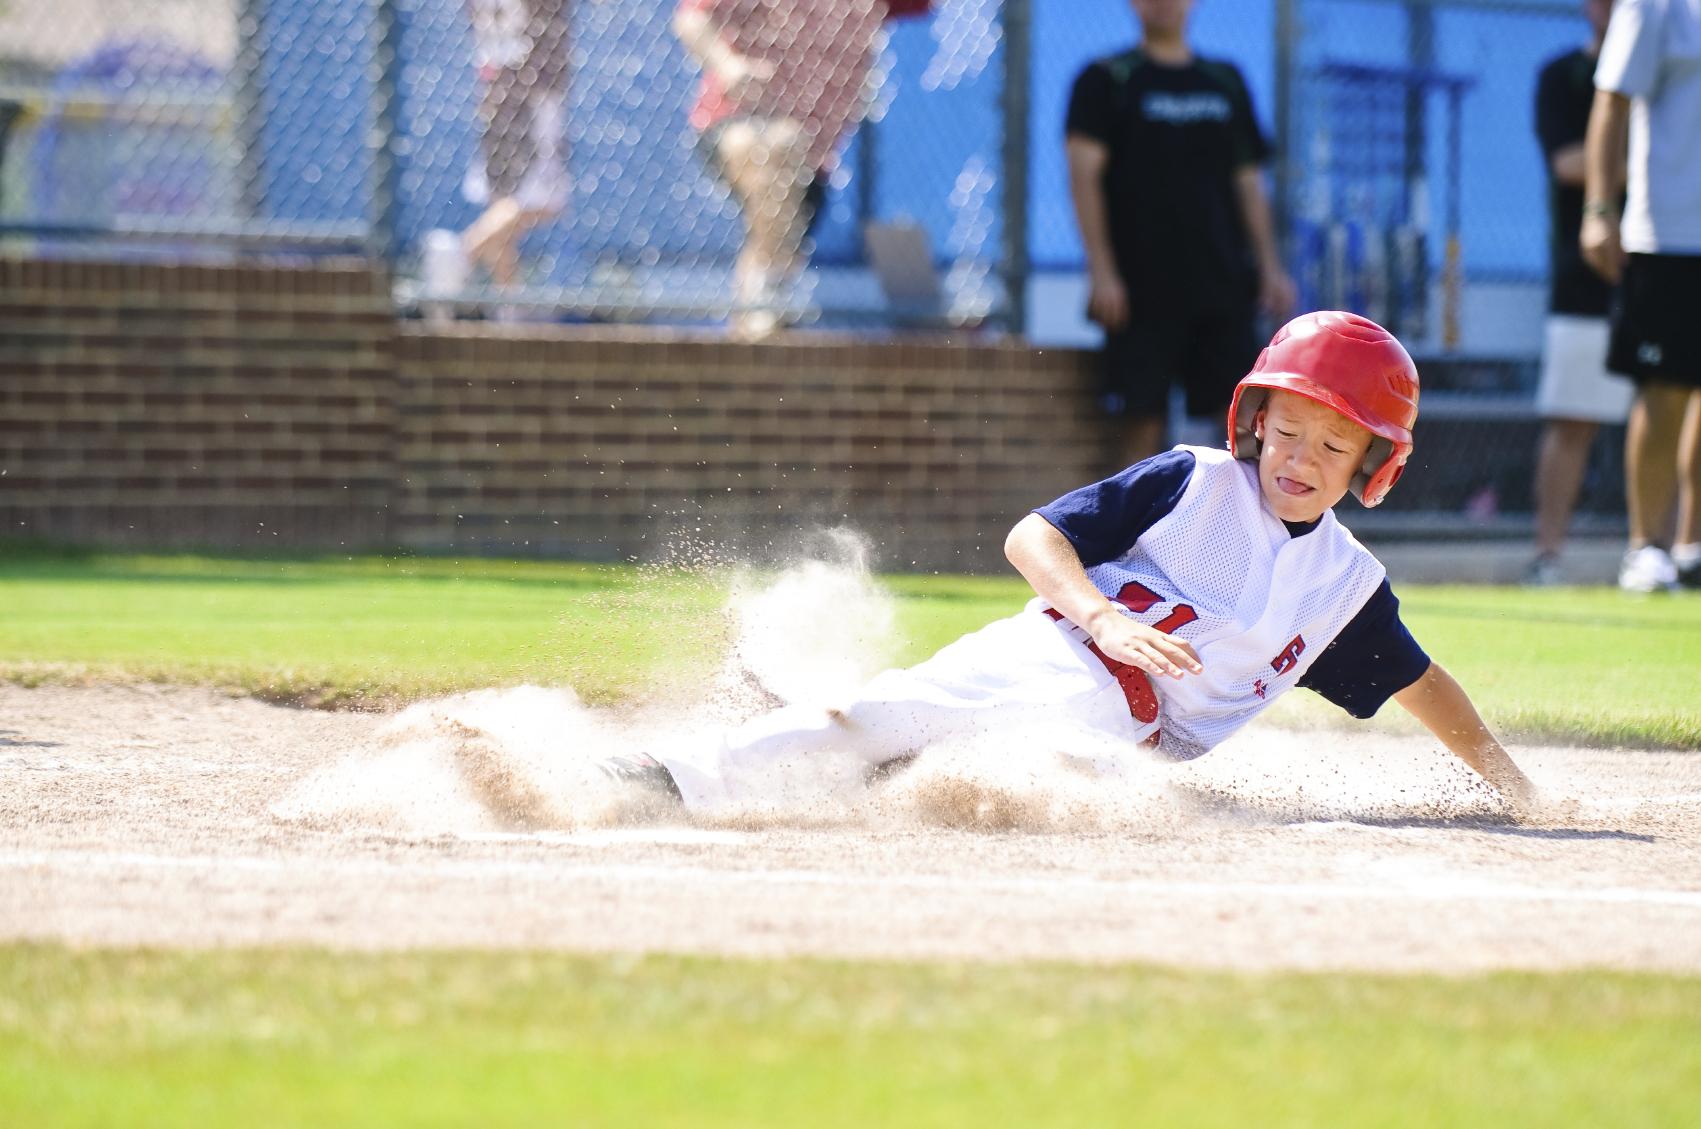 4 Ways to Organize a Productive Baseball Practice - You Go